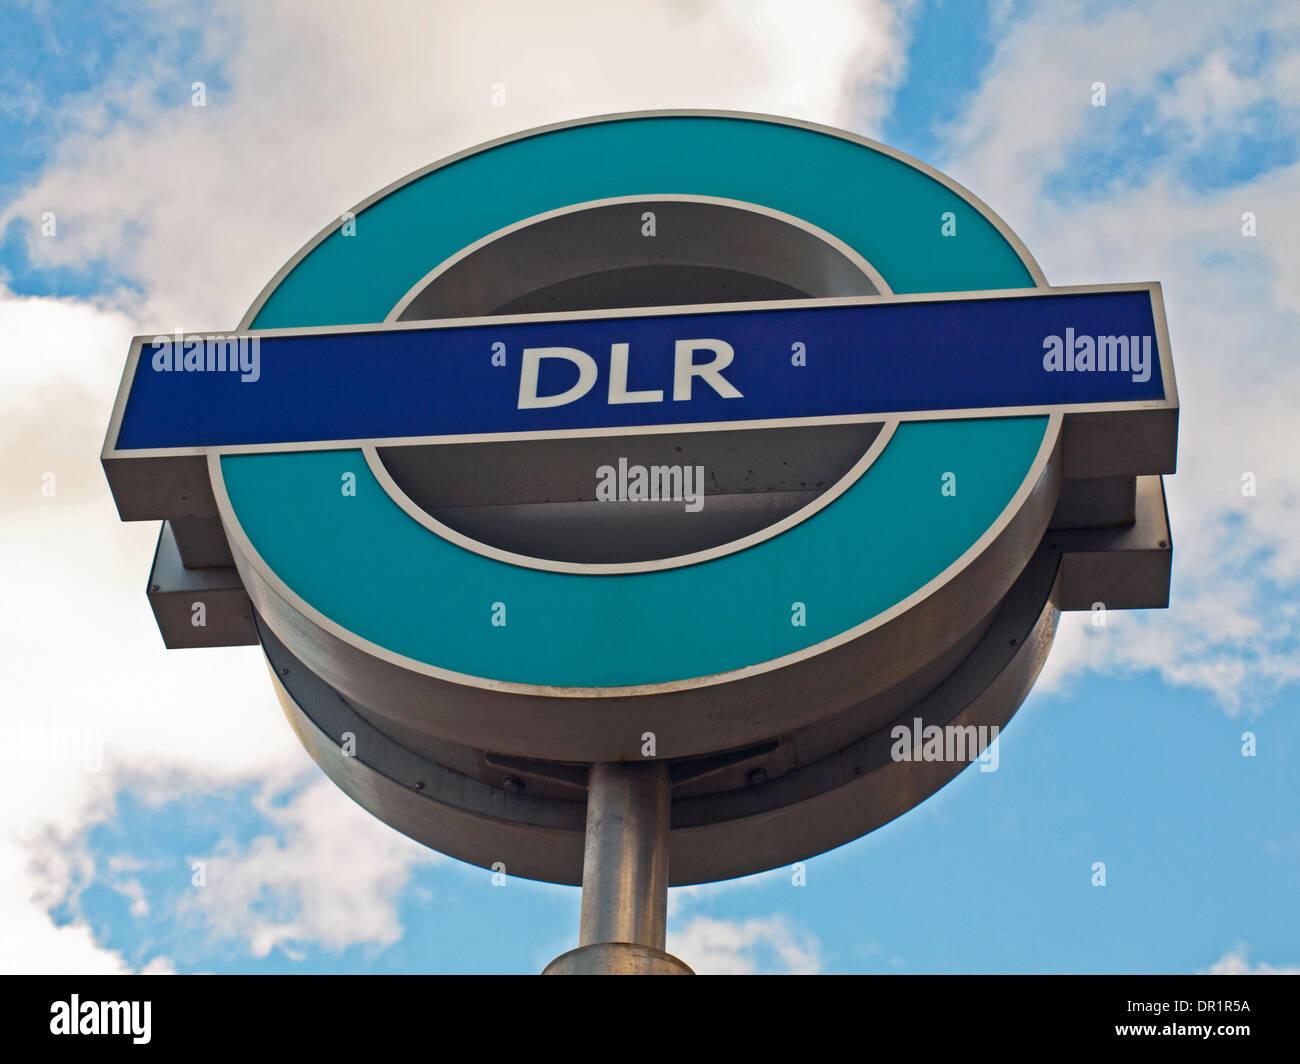 West Silvertown DLR Station roundel, East London, London, England, United Kingdom - Stock Image